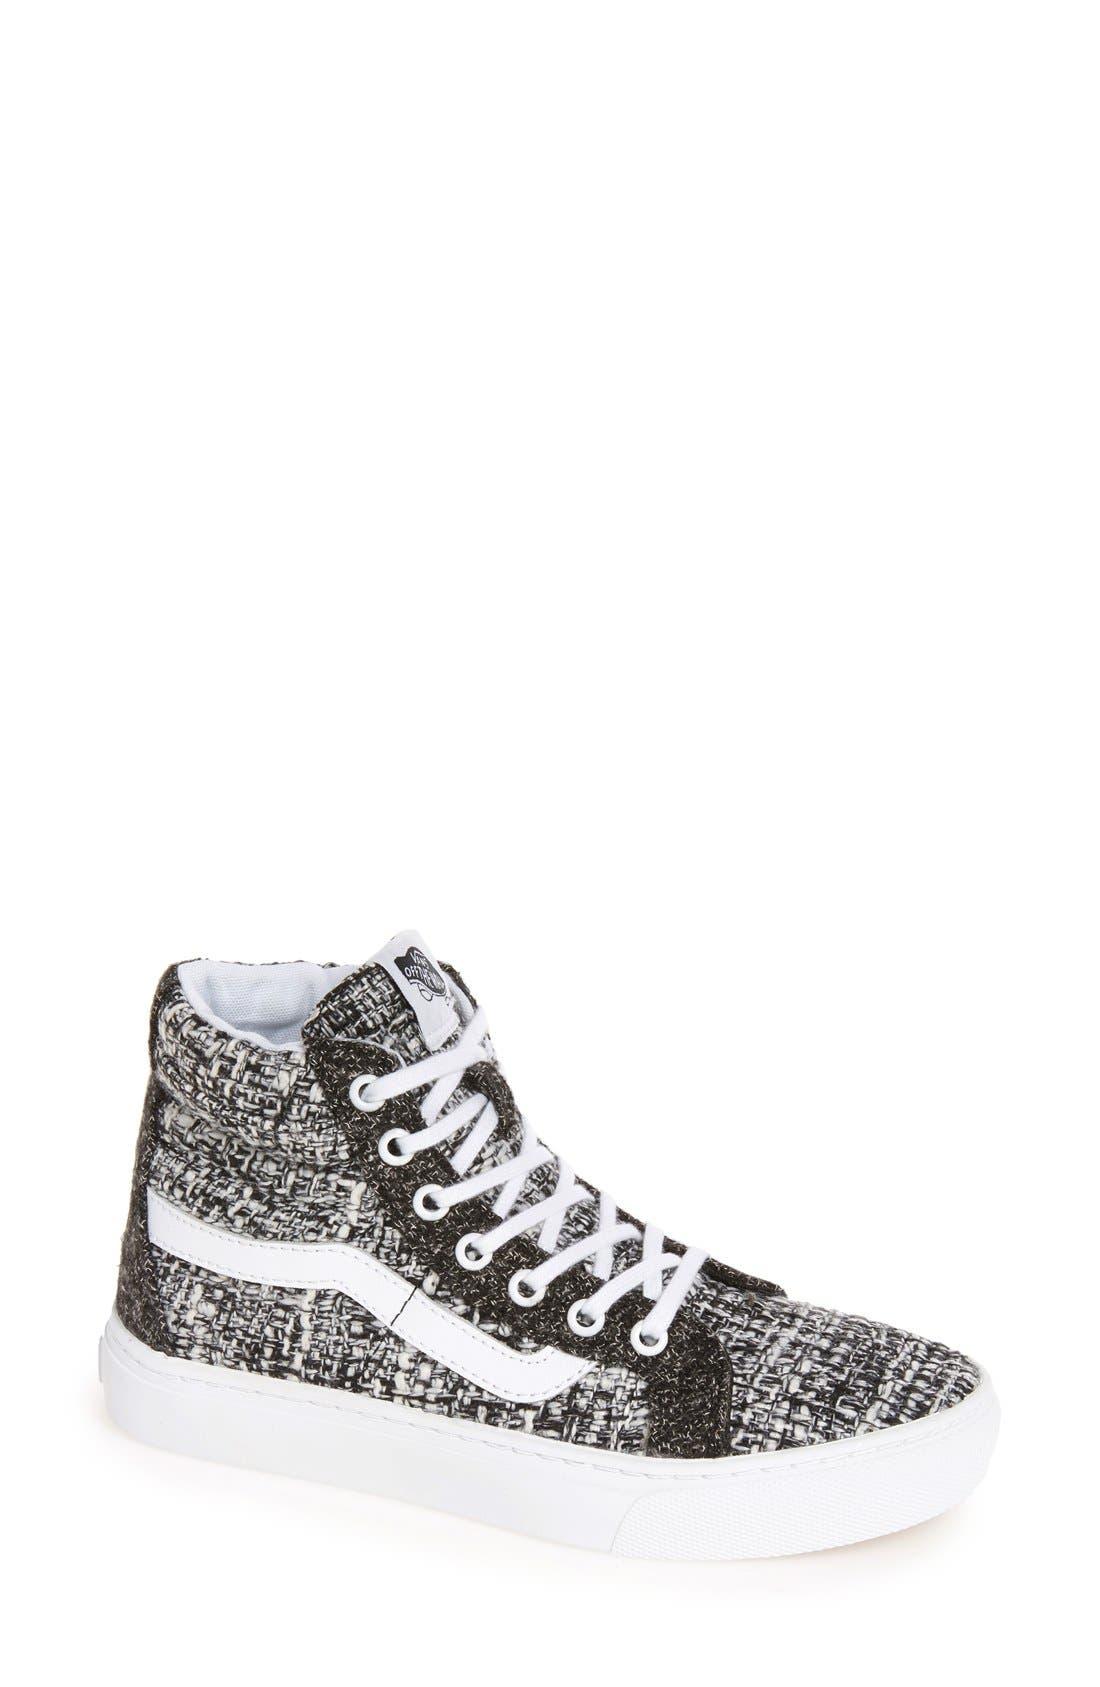 Main Image - Vans Sk8-Hi High Top Sneaker (Women)